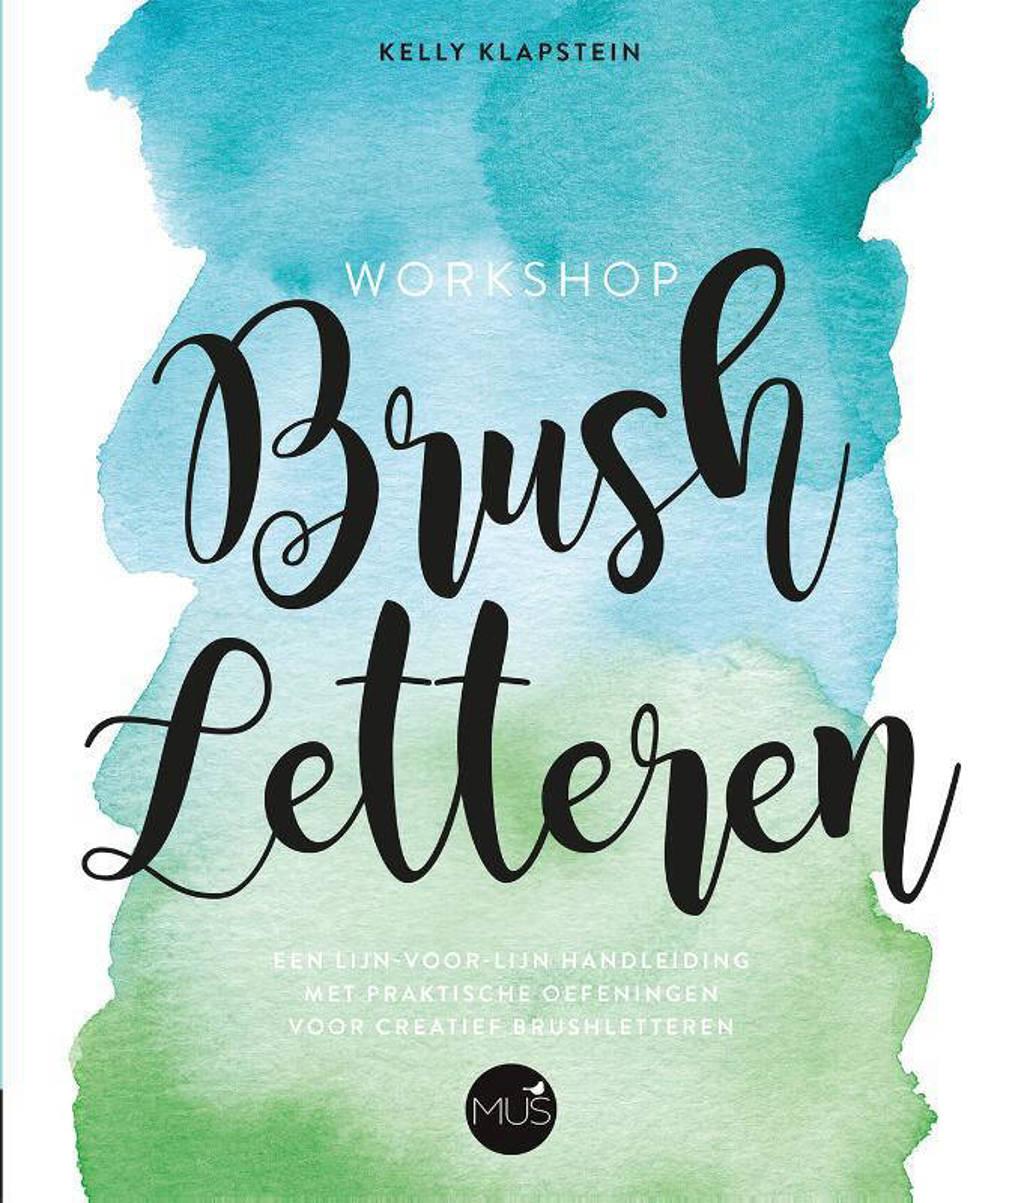 Workshop Brush letteren - Kelly Klapstein